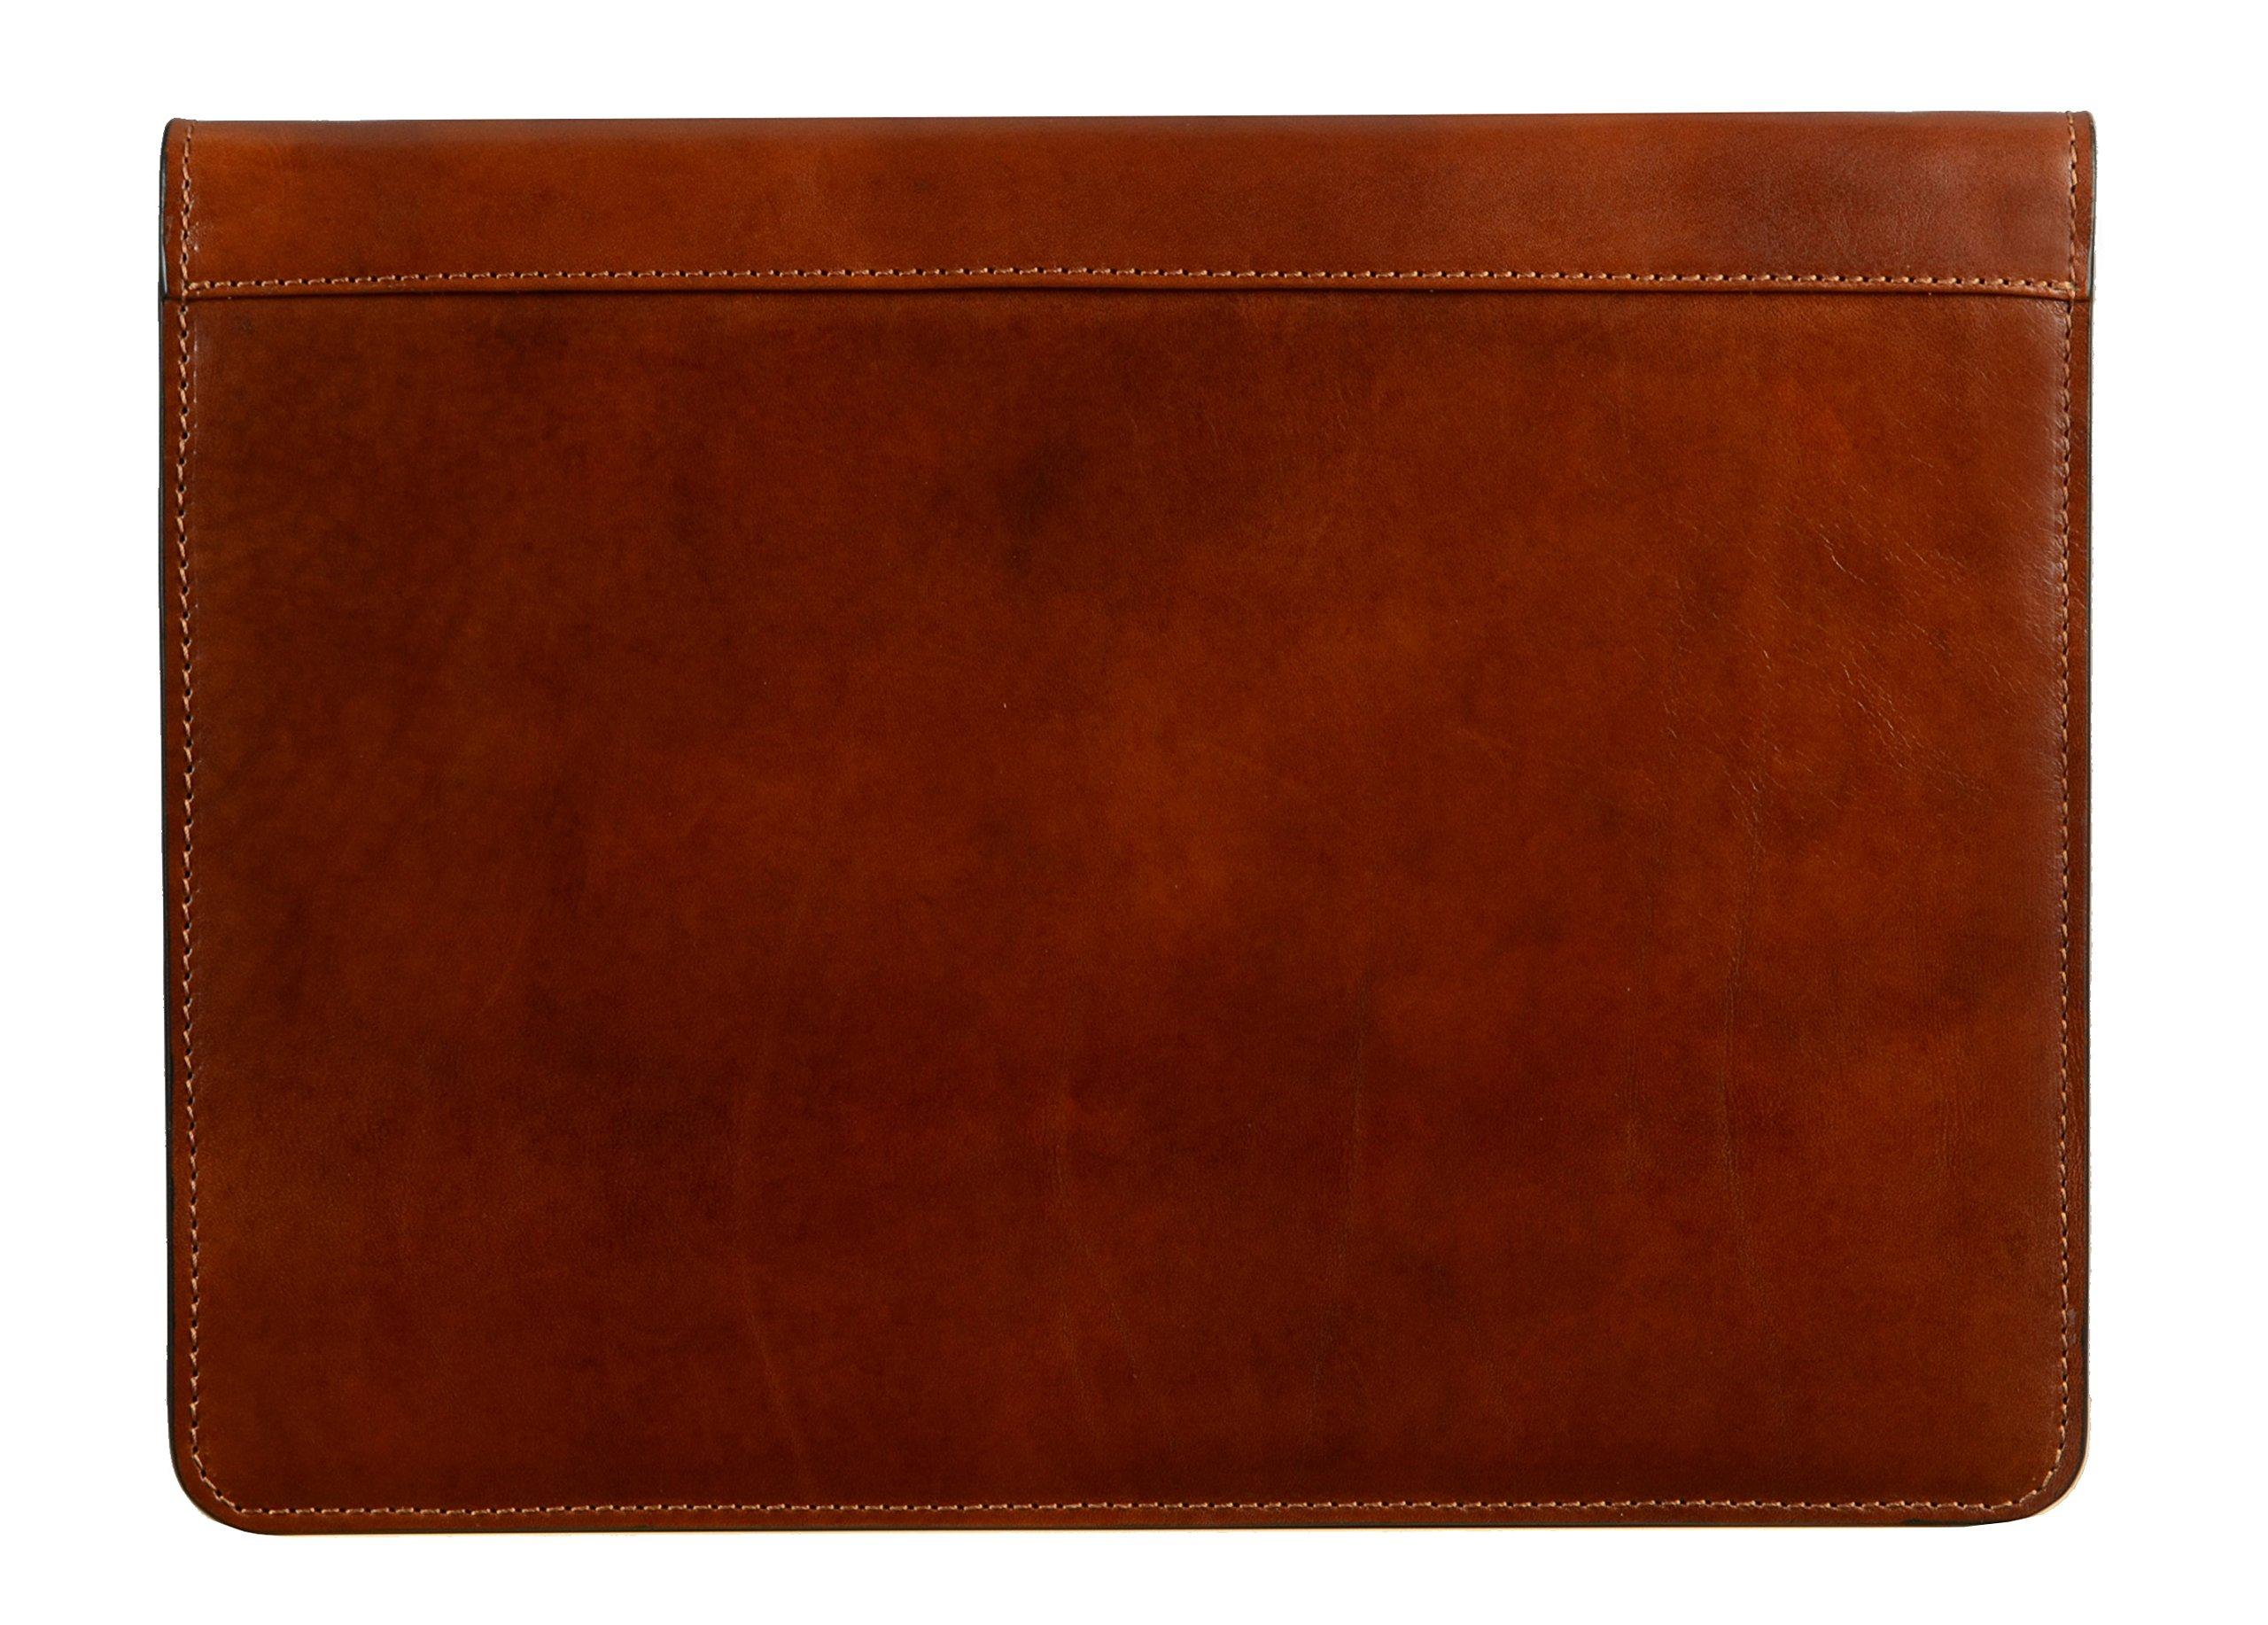 Full Grain Leather Document Folder, Handmade, Brown Portfolio, Organizer,Document Holder, Case, Unisex Classy Best Color Amber - Time Resistance